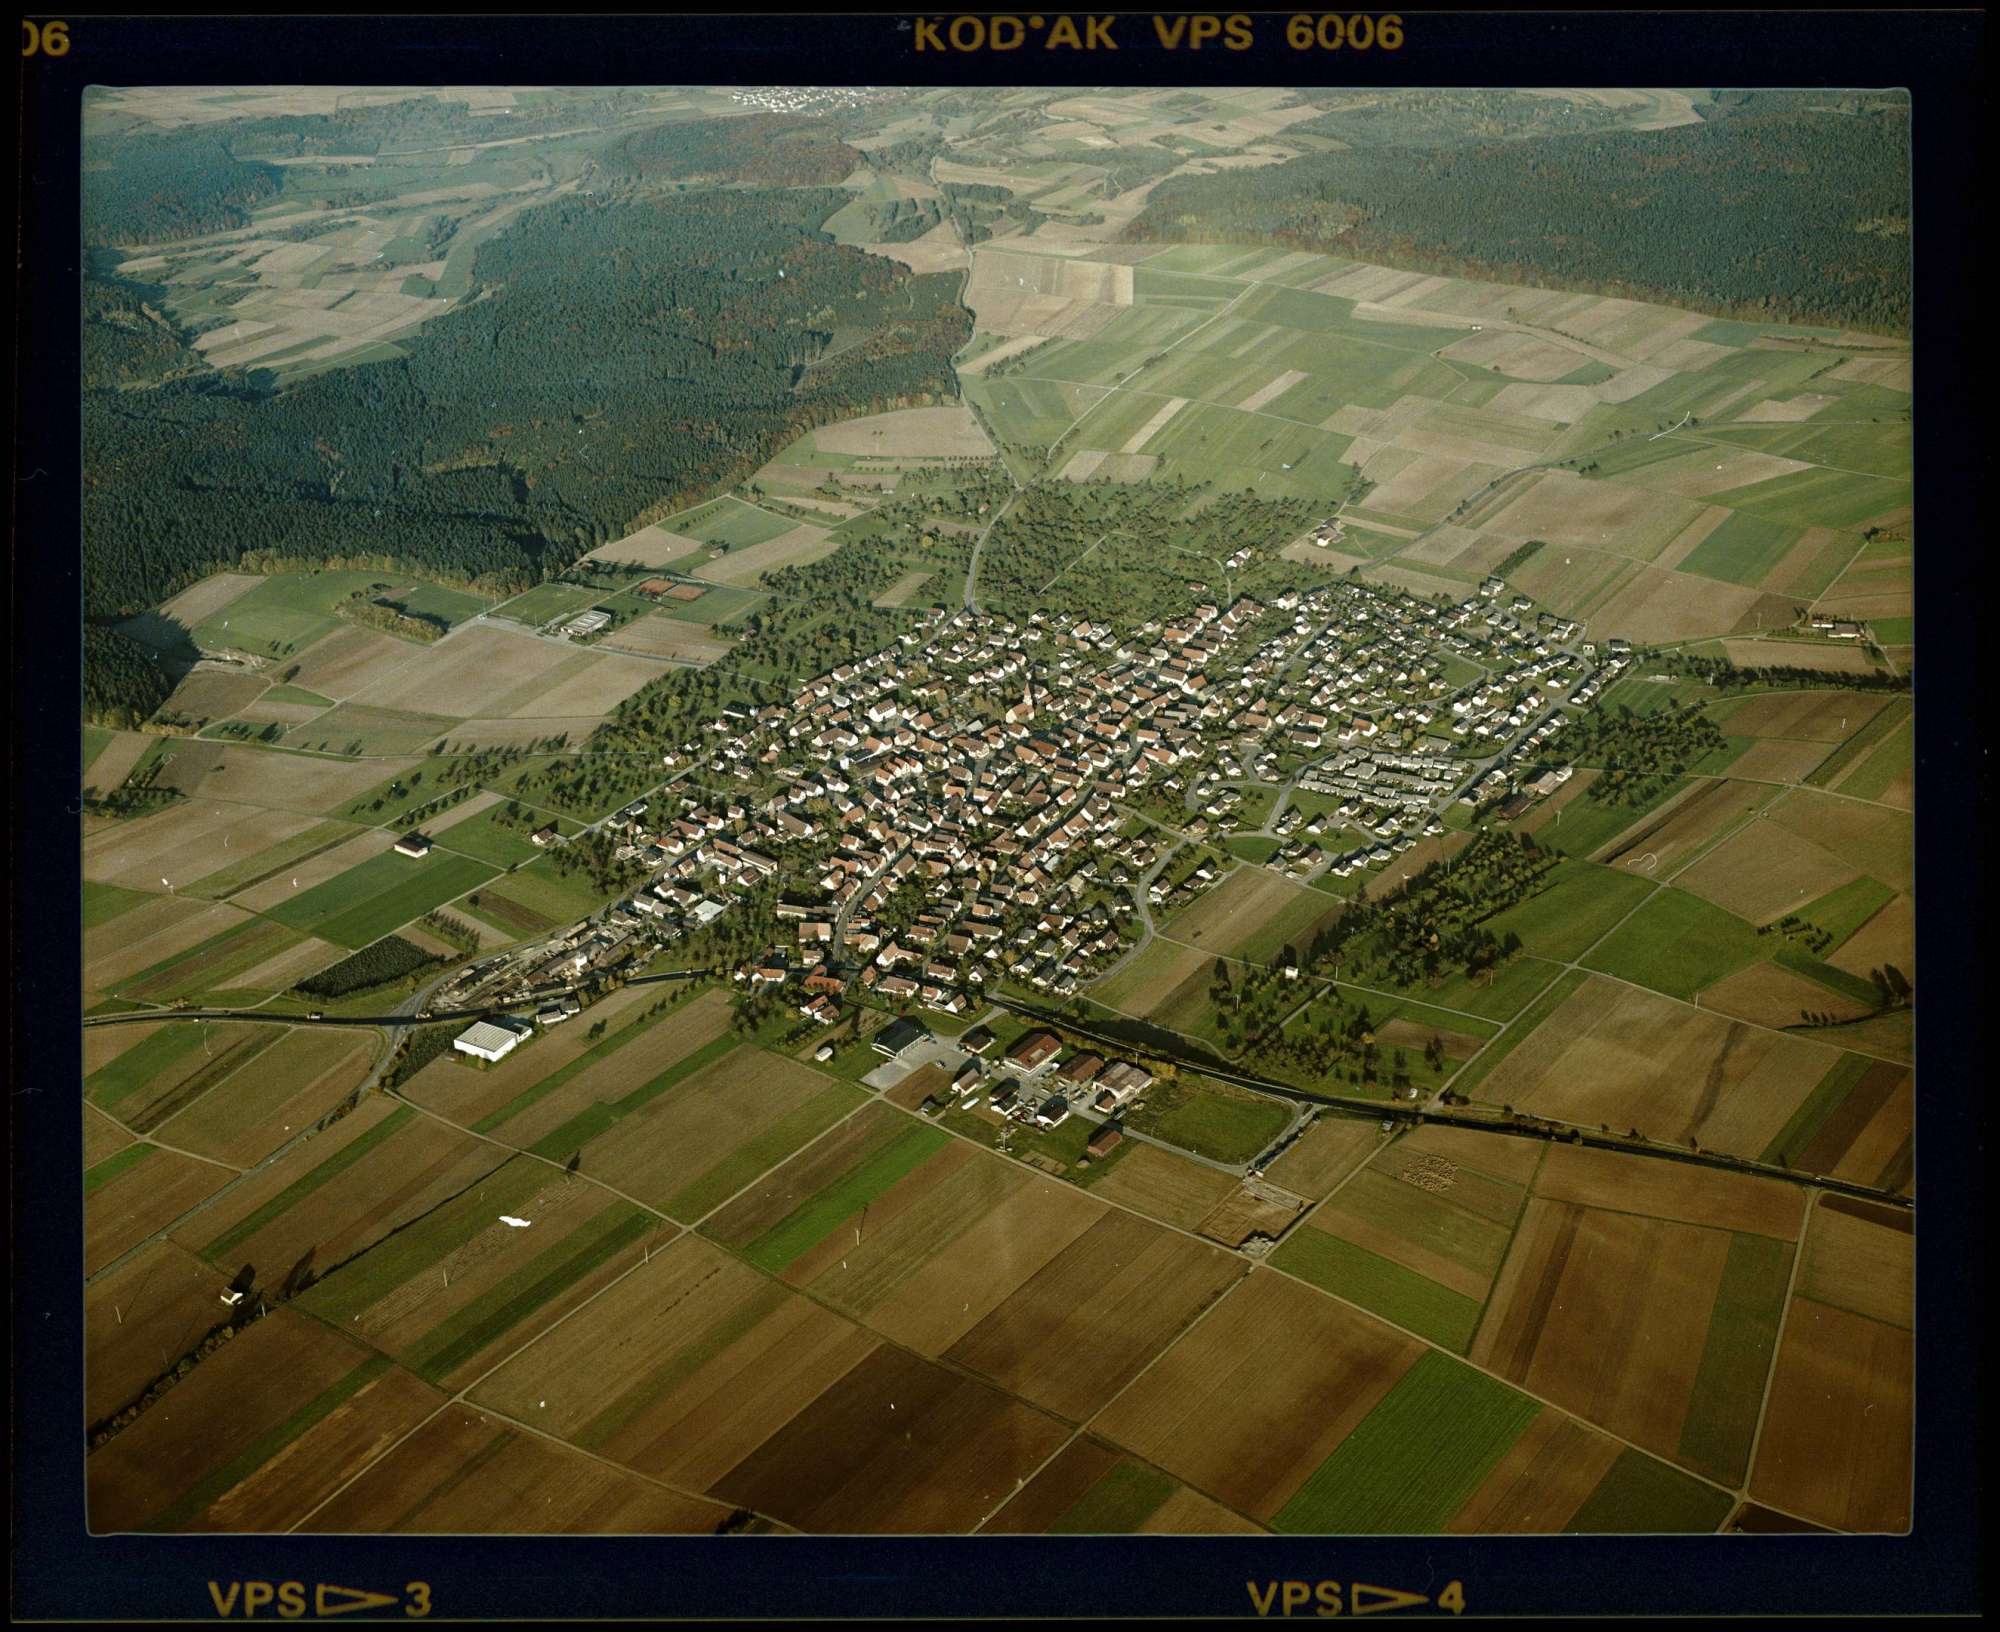 Deckenpfronn, Luftbild, Bild 1